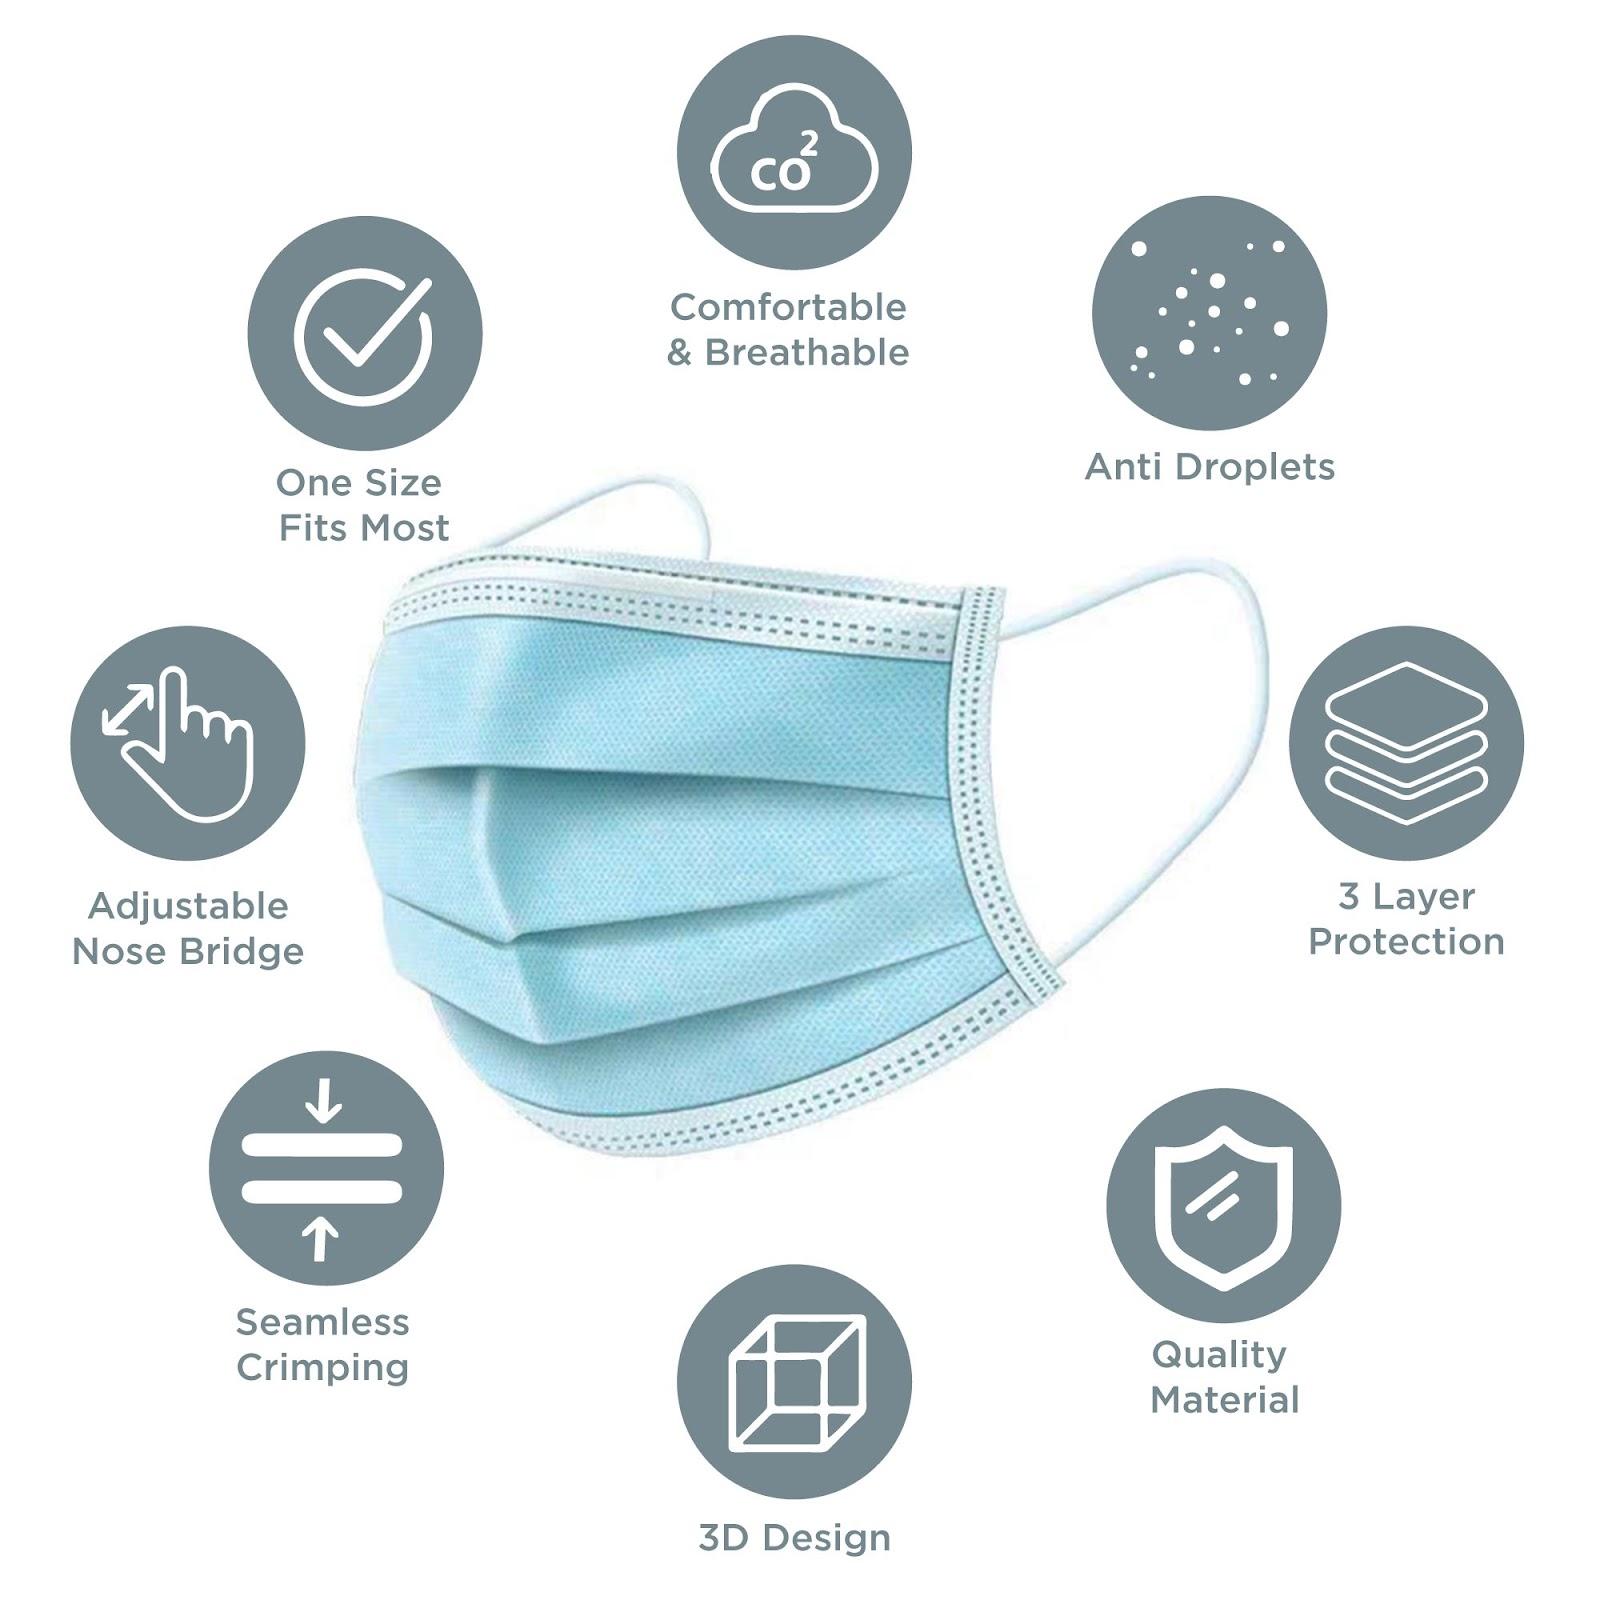 Benefits of Remedi Pure masks